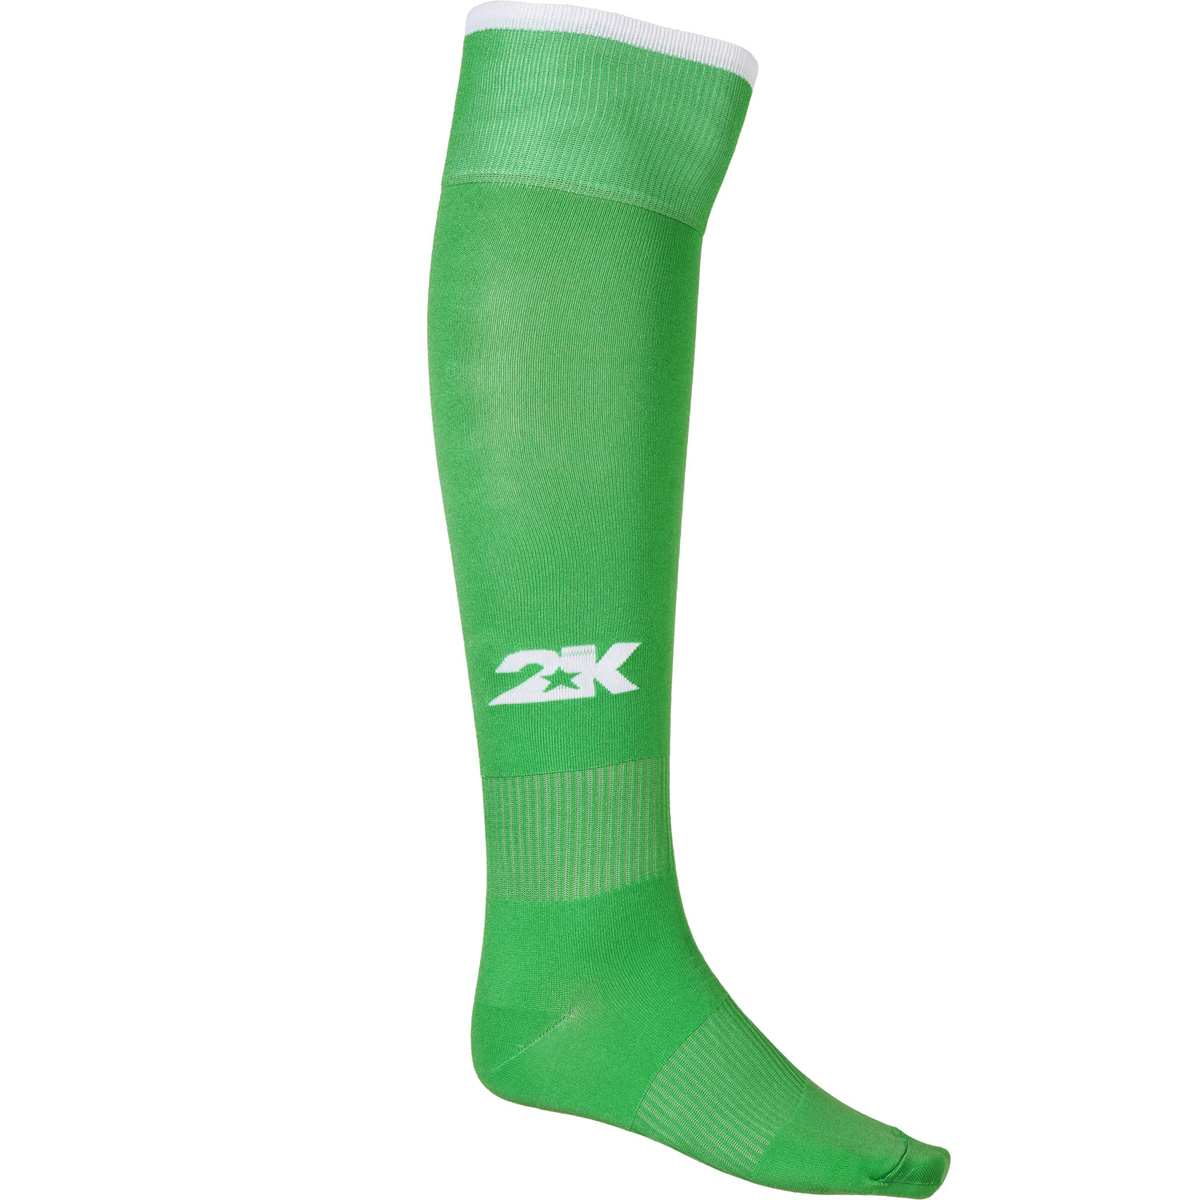 Гетры футбольные 2K Sport Classic, цвет: зеленый, белый. 120334. Размер 41/46